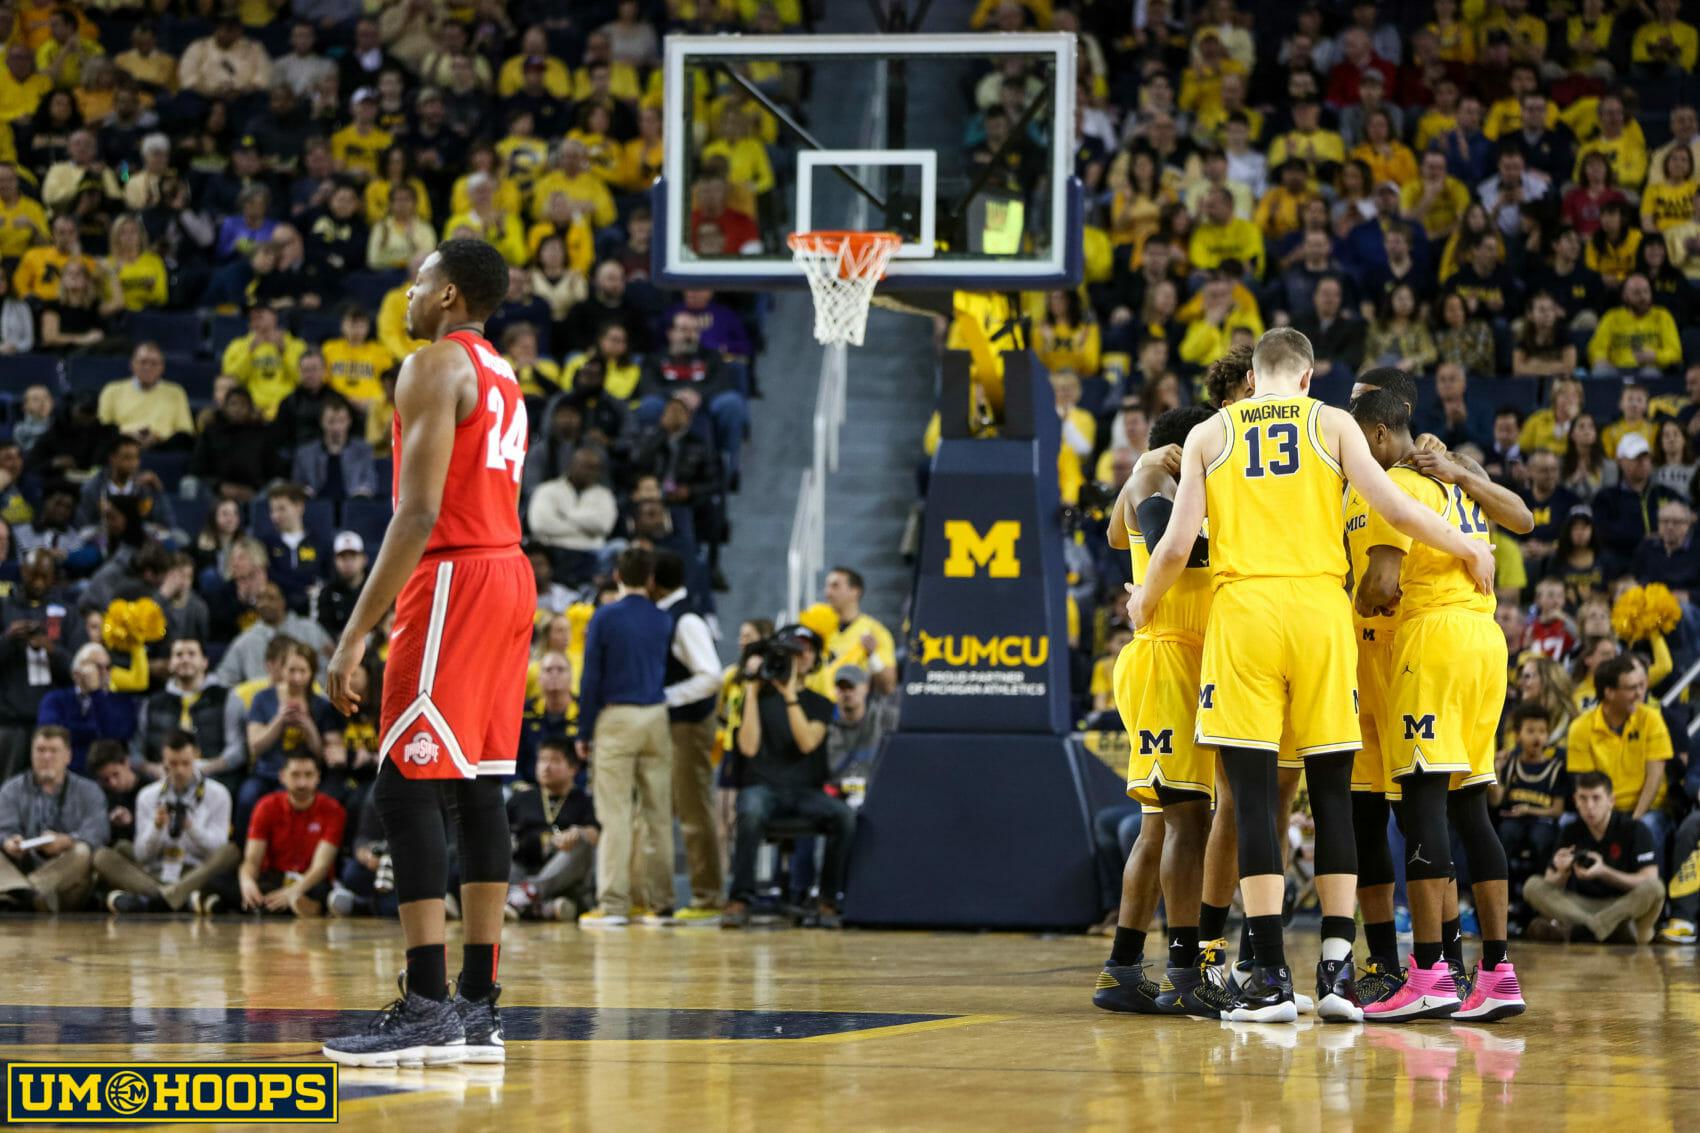 Michigan 74, Ohio State 62-5